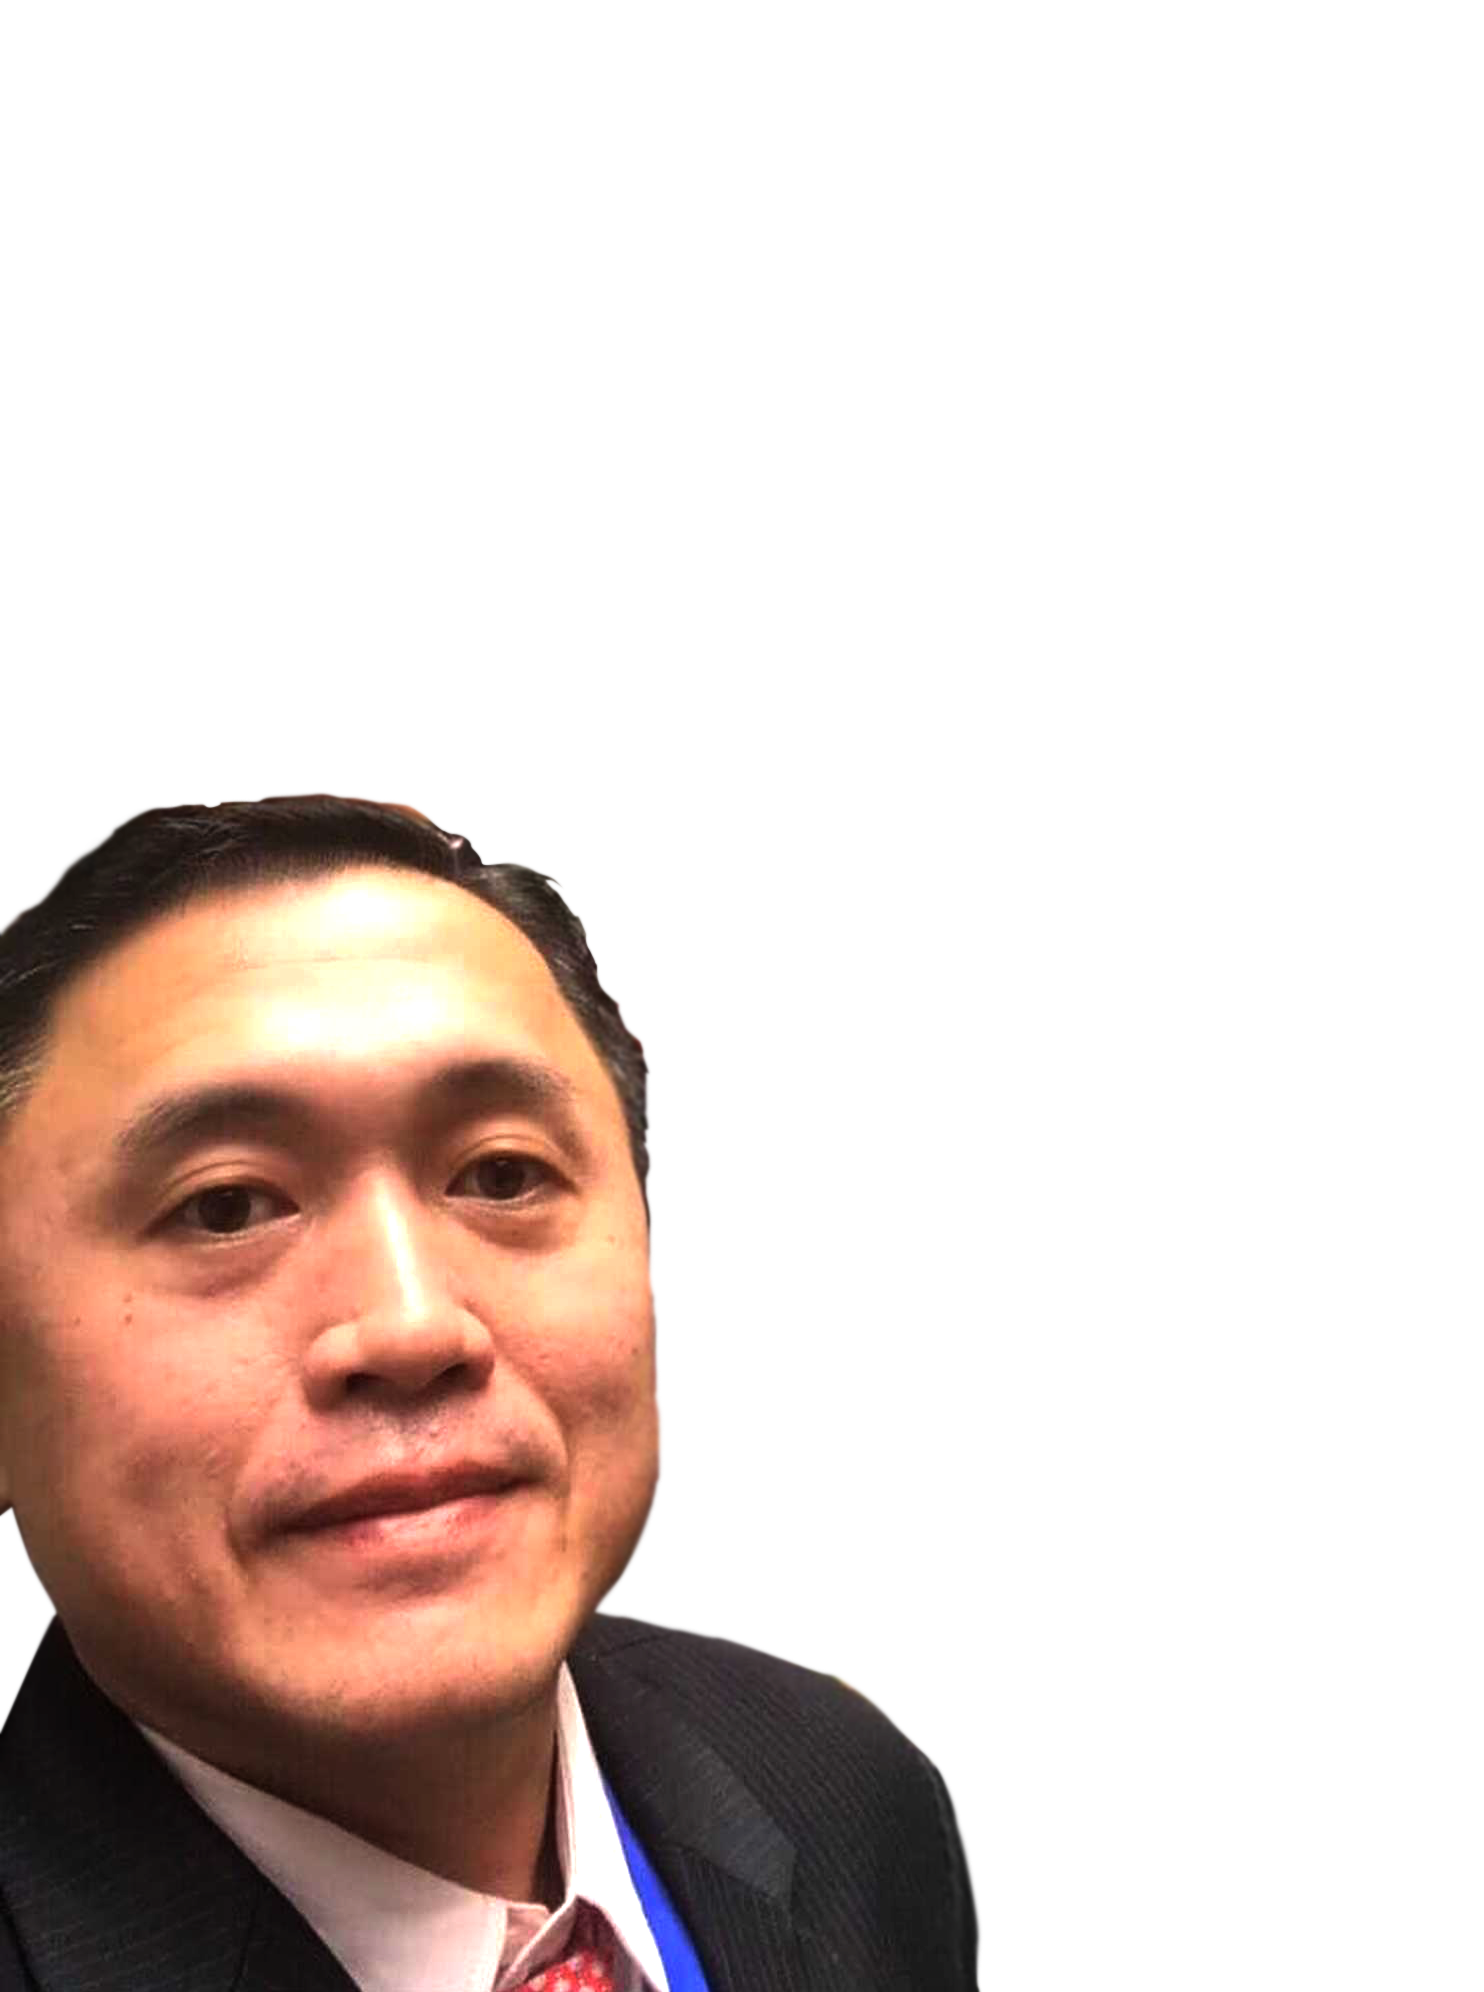 Sprite Meme Generator Usa Vs Philippines Meme Template